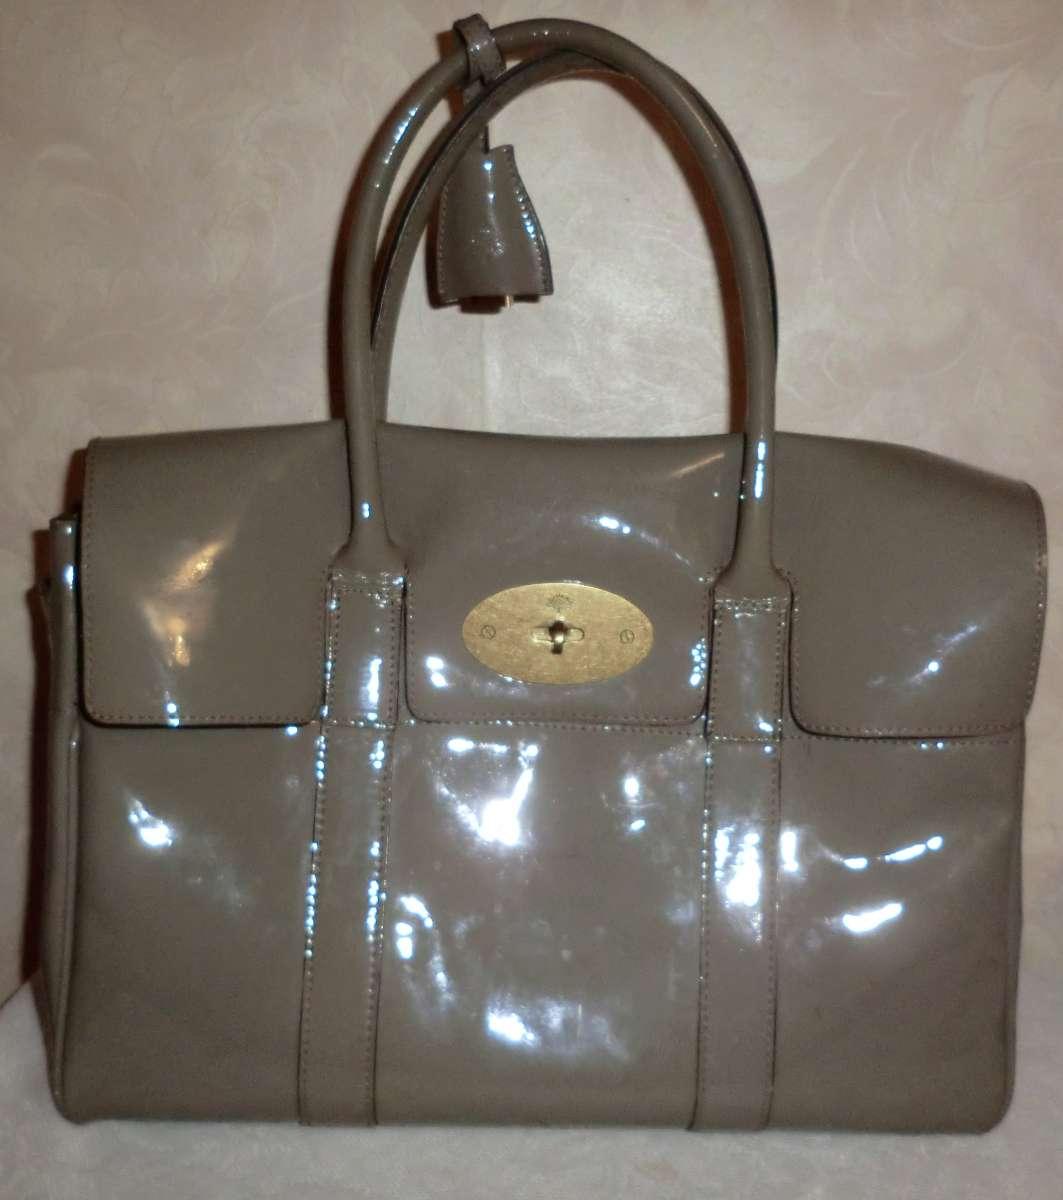 7a2820310150 Рептилия кожаная dior сумка женская черная кожа натуральная hermes lux